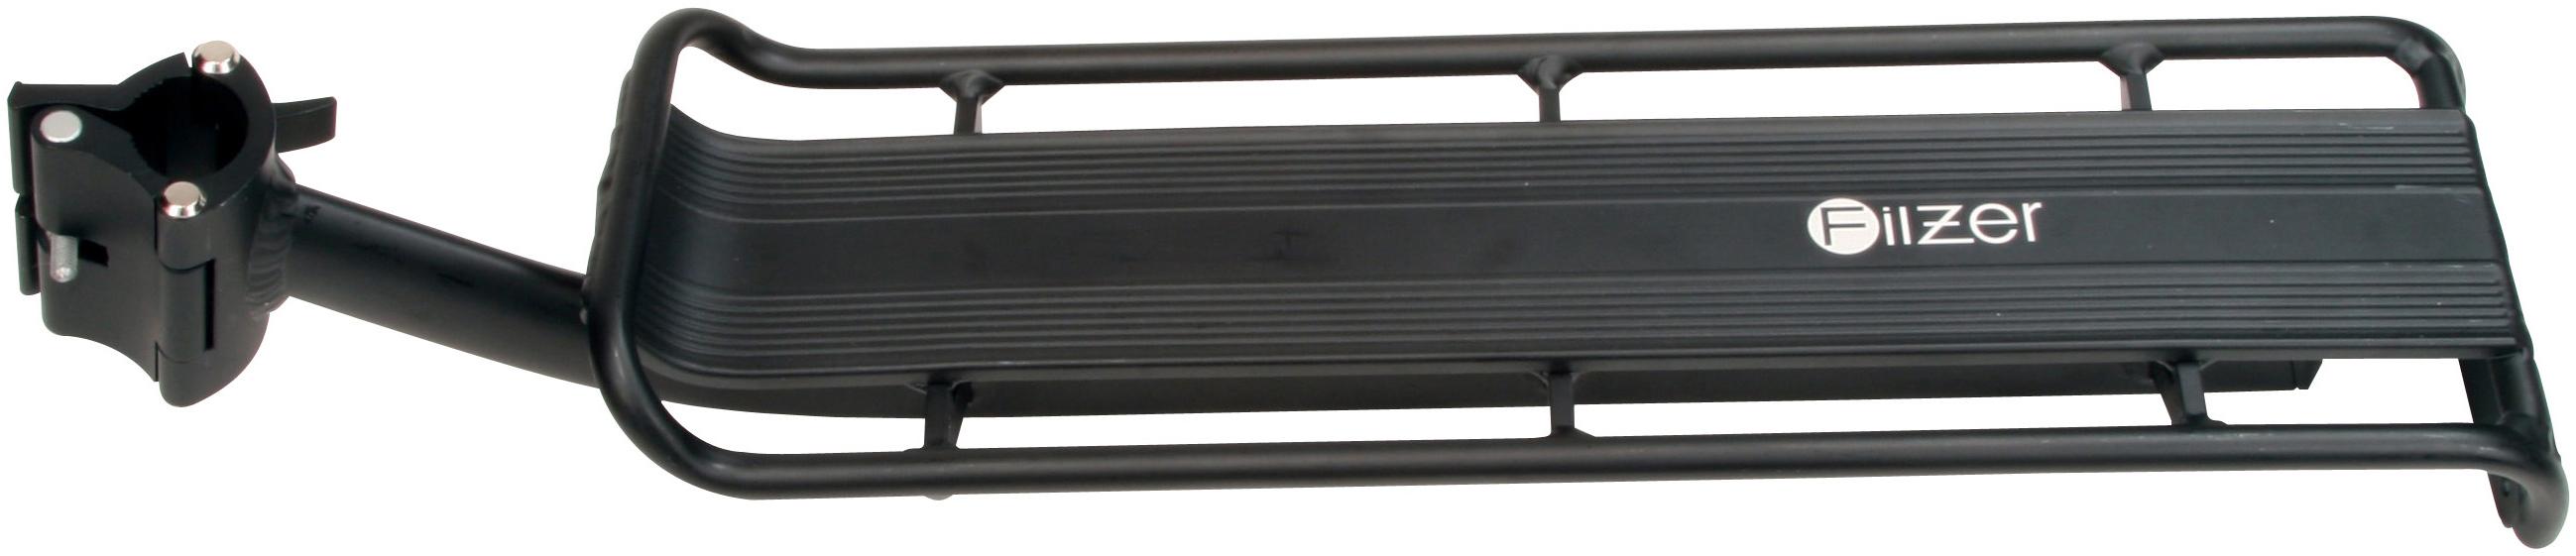 57795c2b504 Filzer Rear Seat Post Rack PR-3